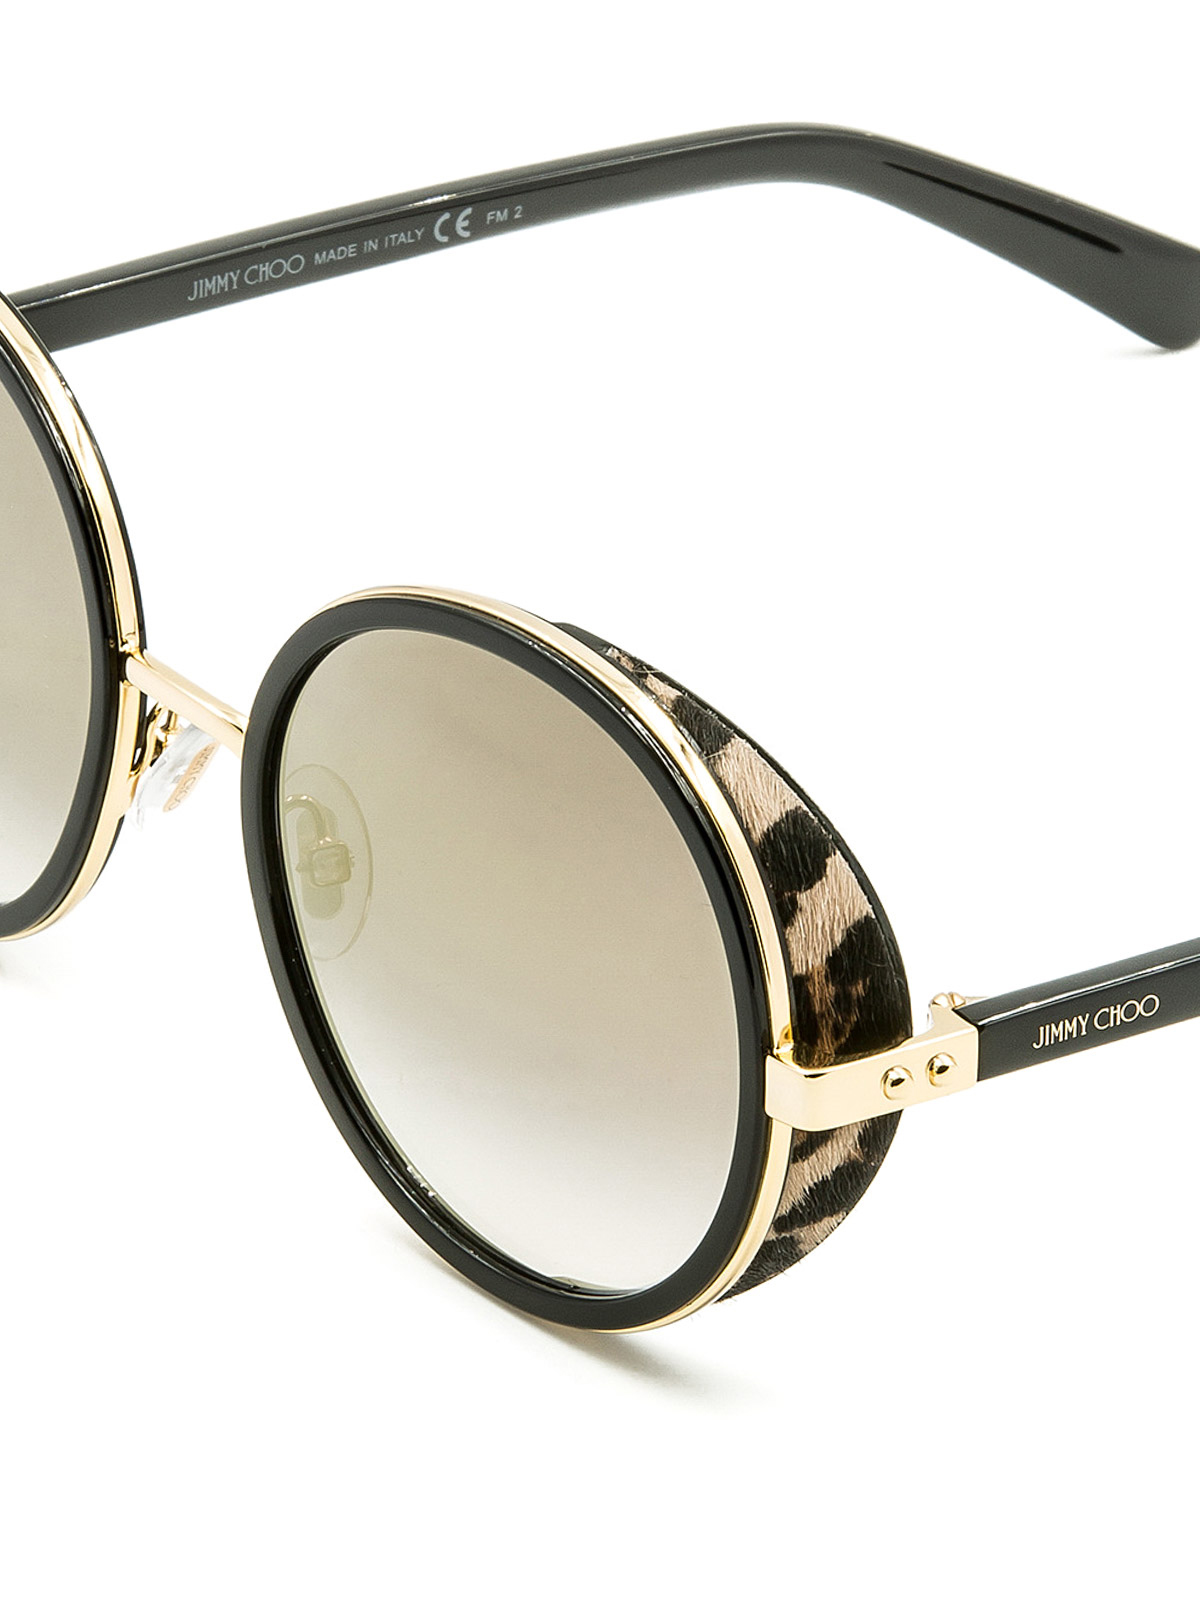 16ef50c93ef9 Jimmy Choo - Andie round frame sunglasses - sunglasses - ANDIENS0NQFQ